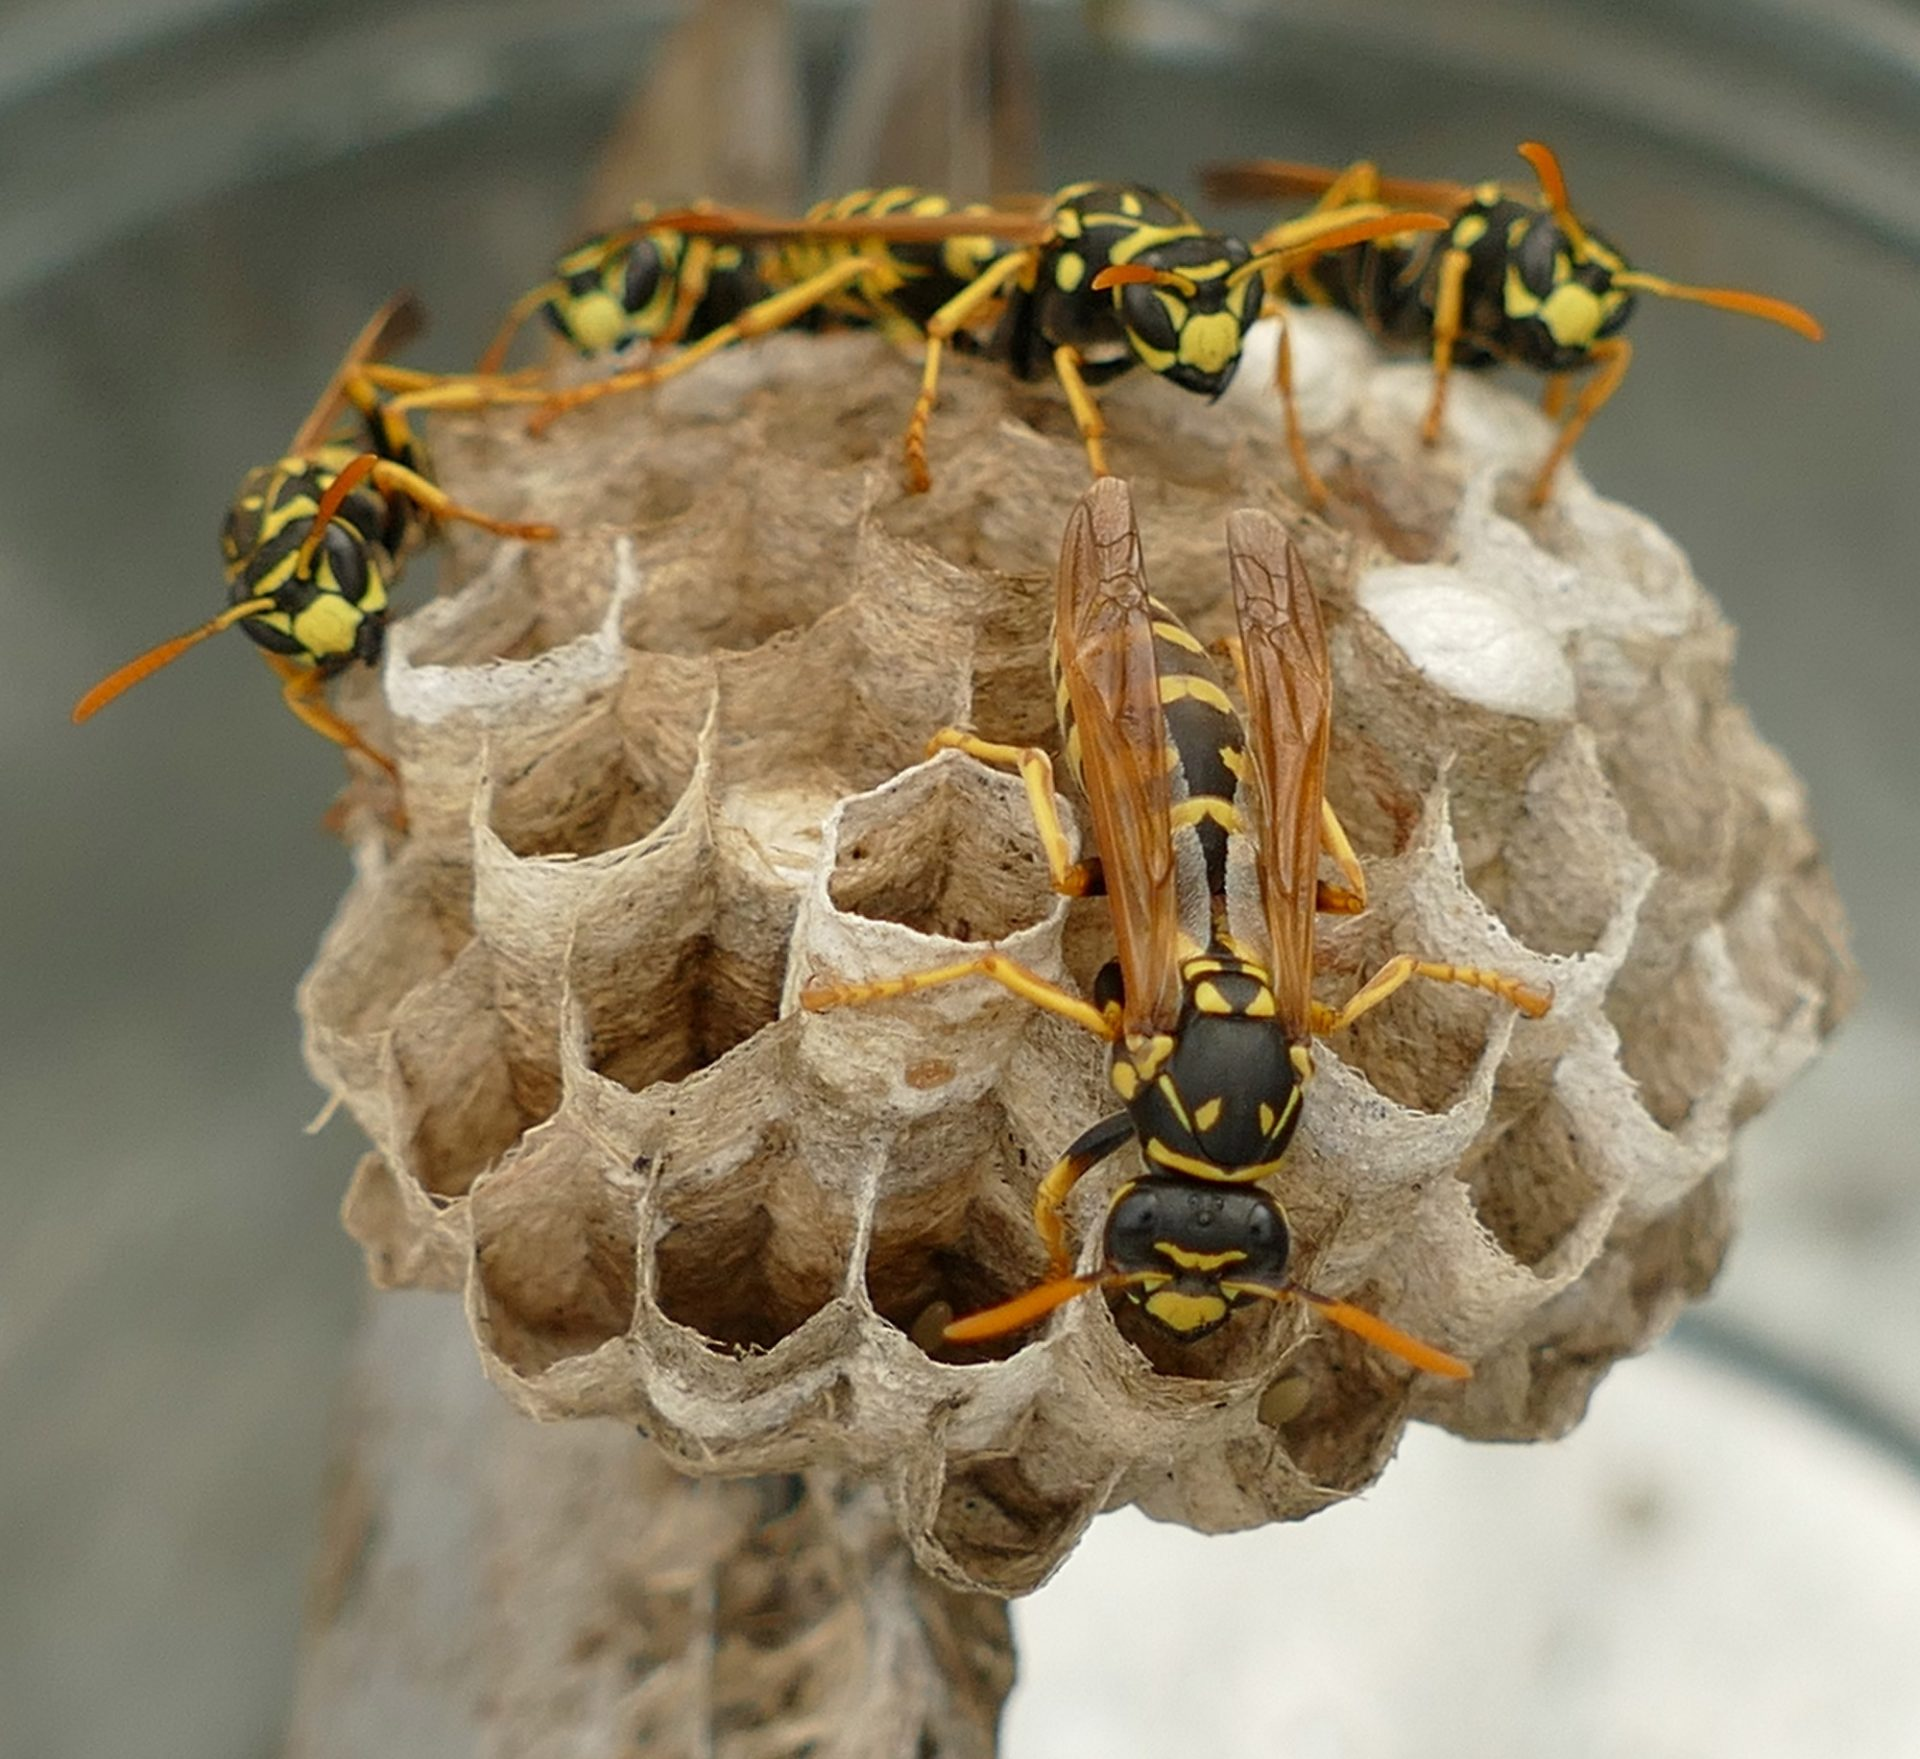 SOS: Mám pod strechou včely, osy a sršne